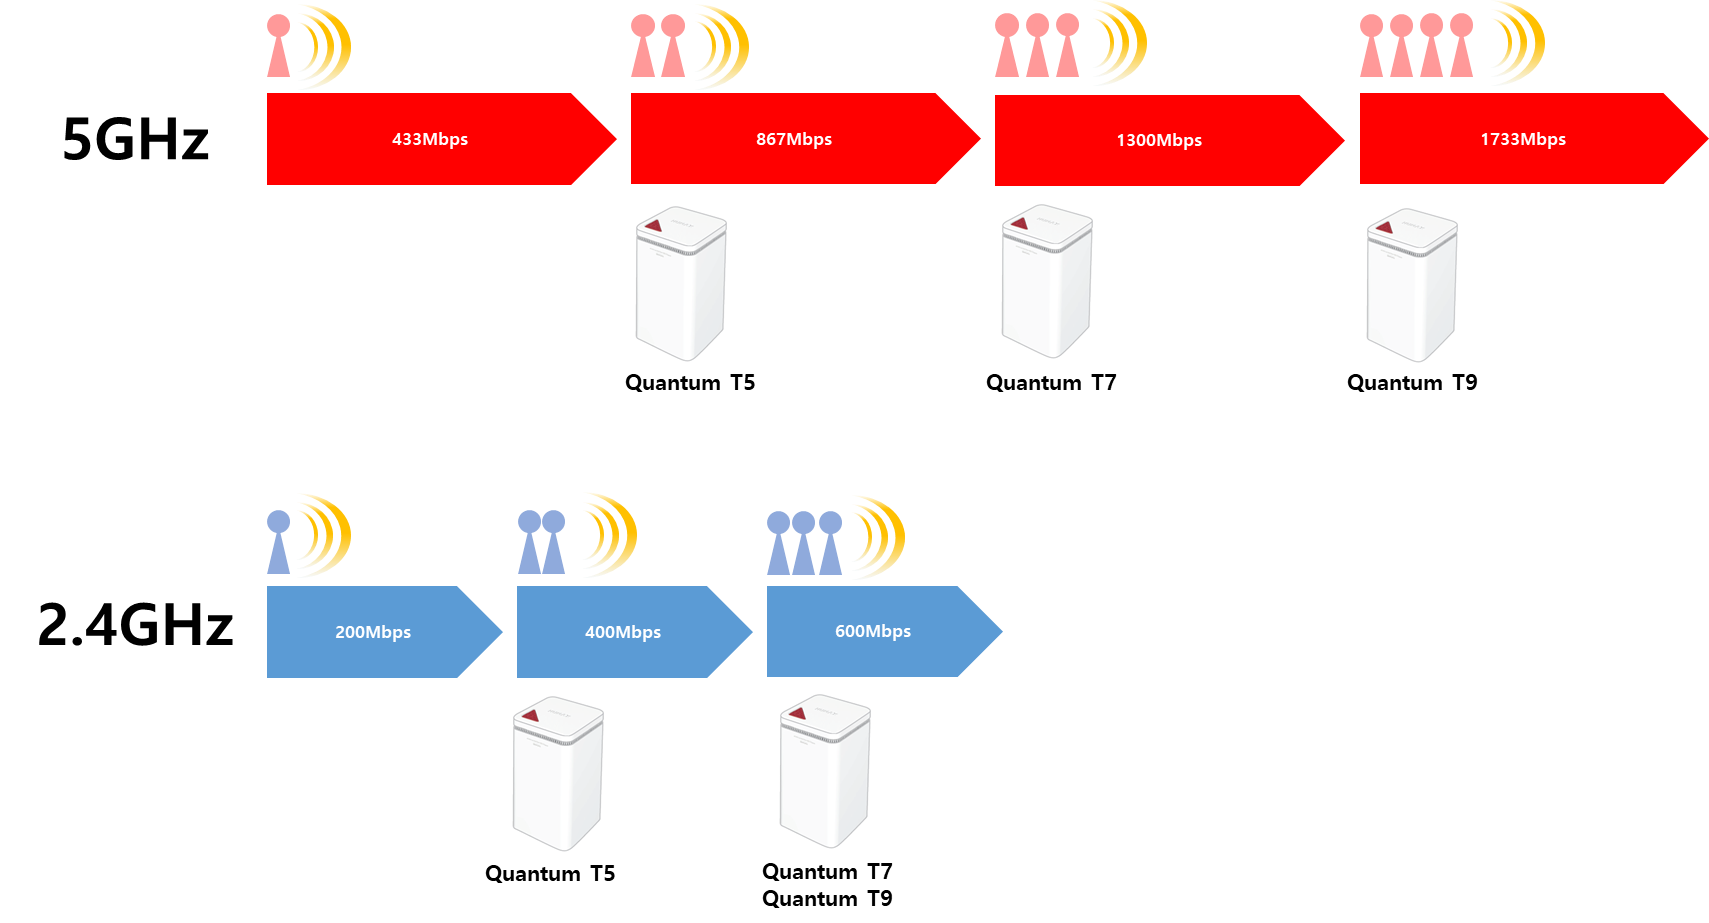 T9_QuantumTSeriesWiFiMaxRate